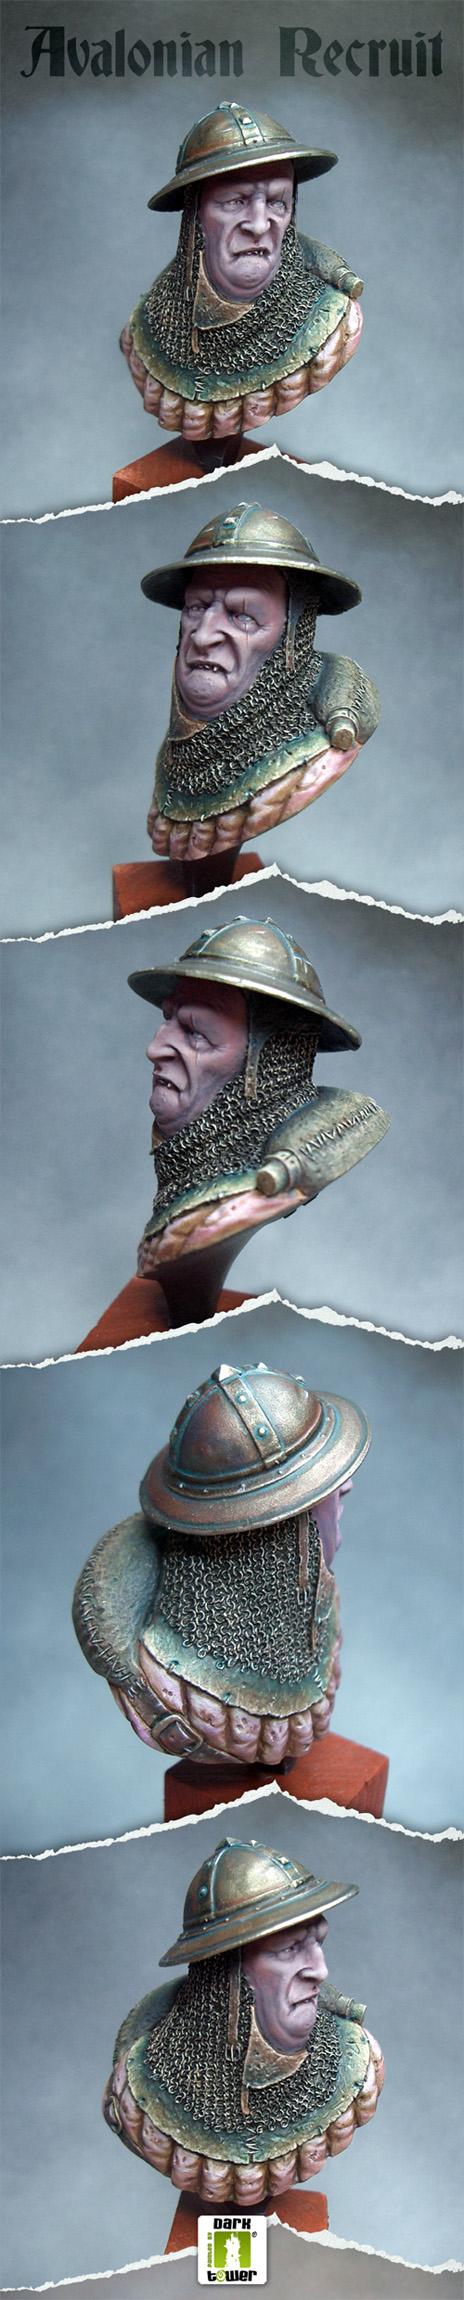 Avalonian Recruit